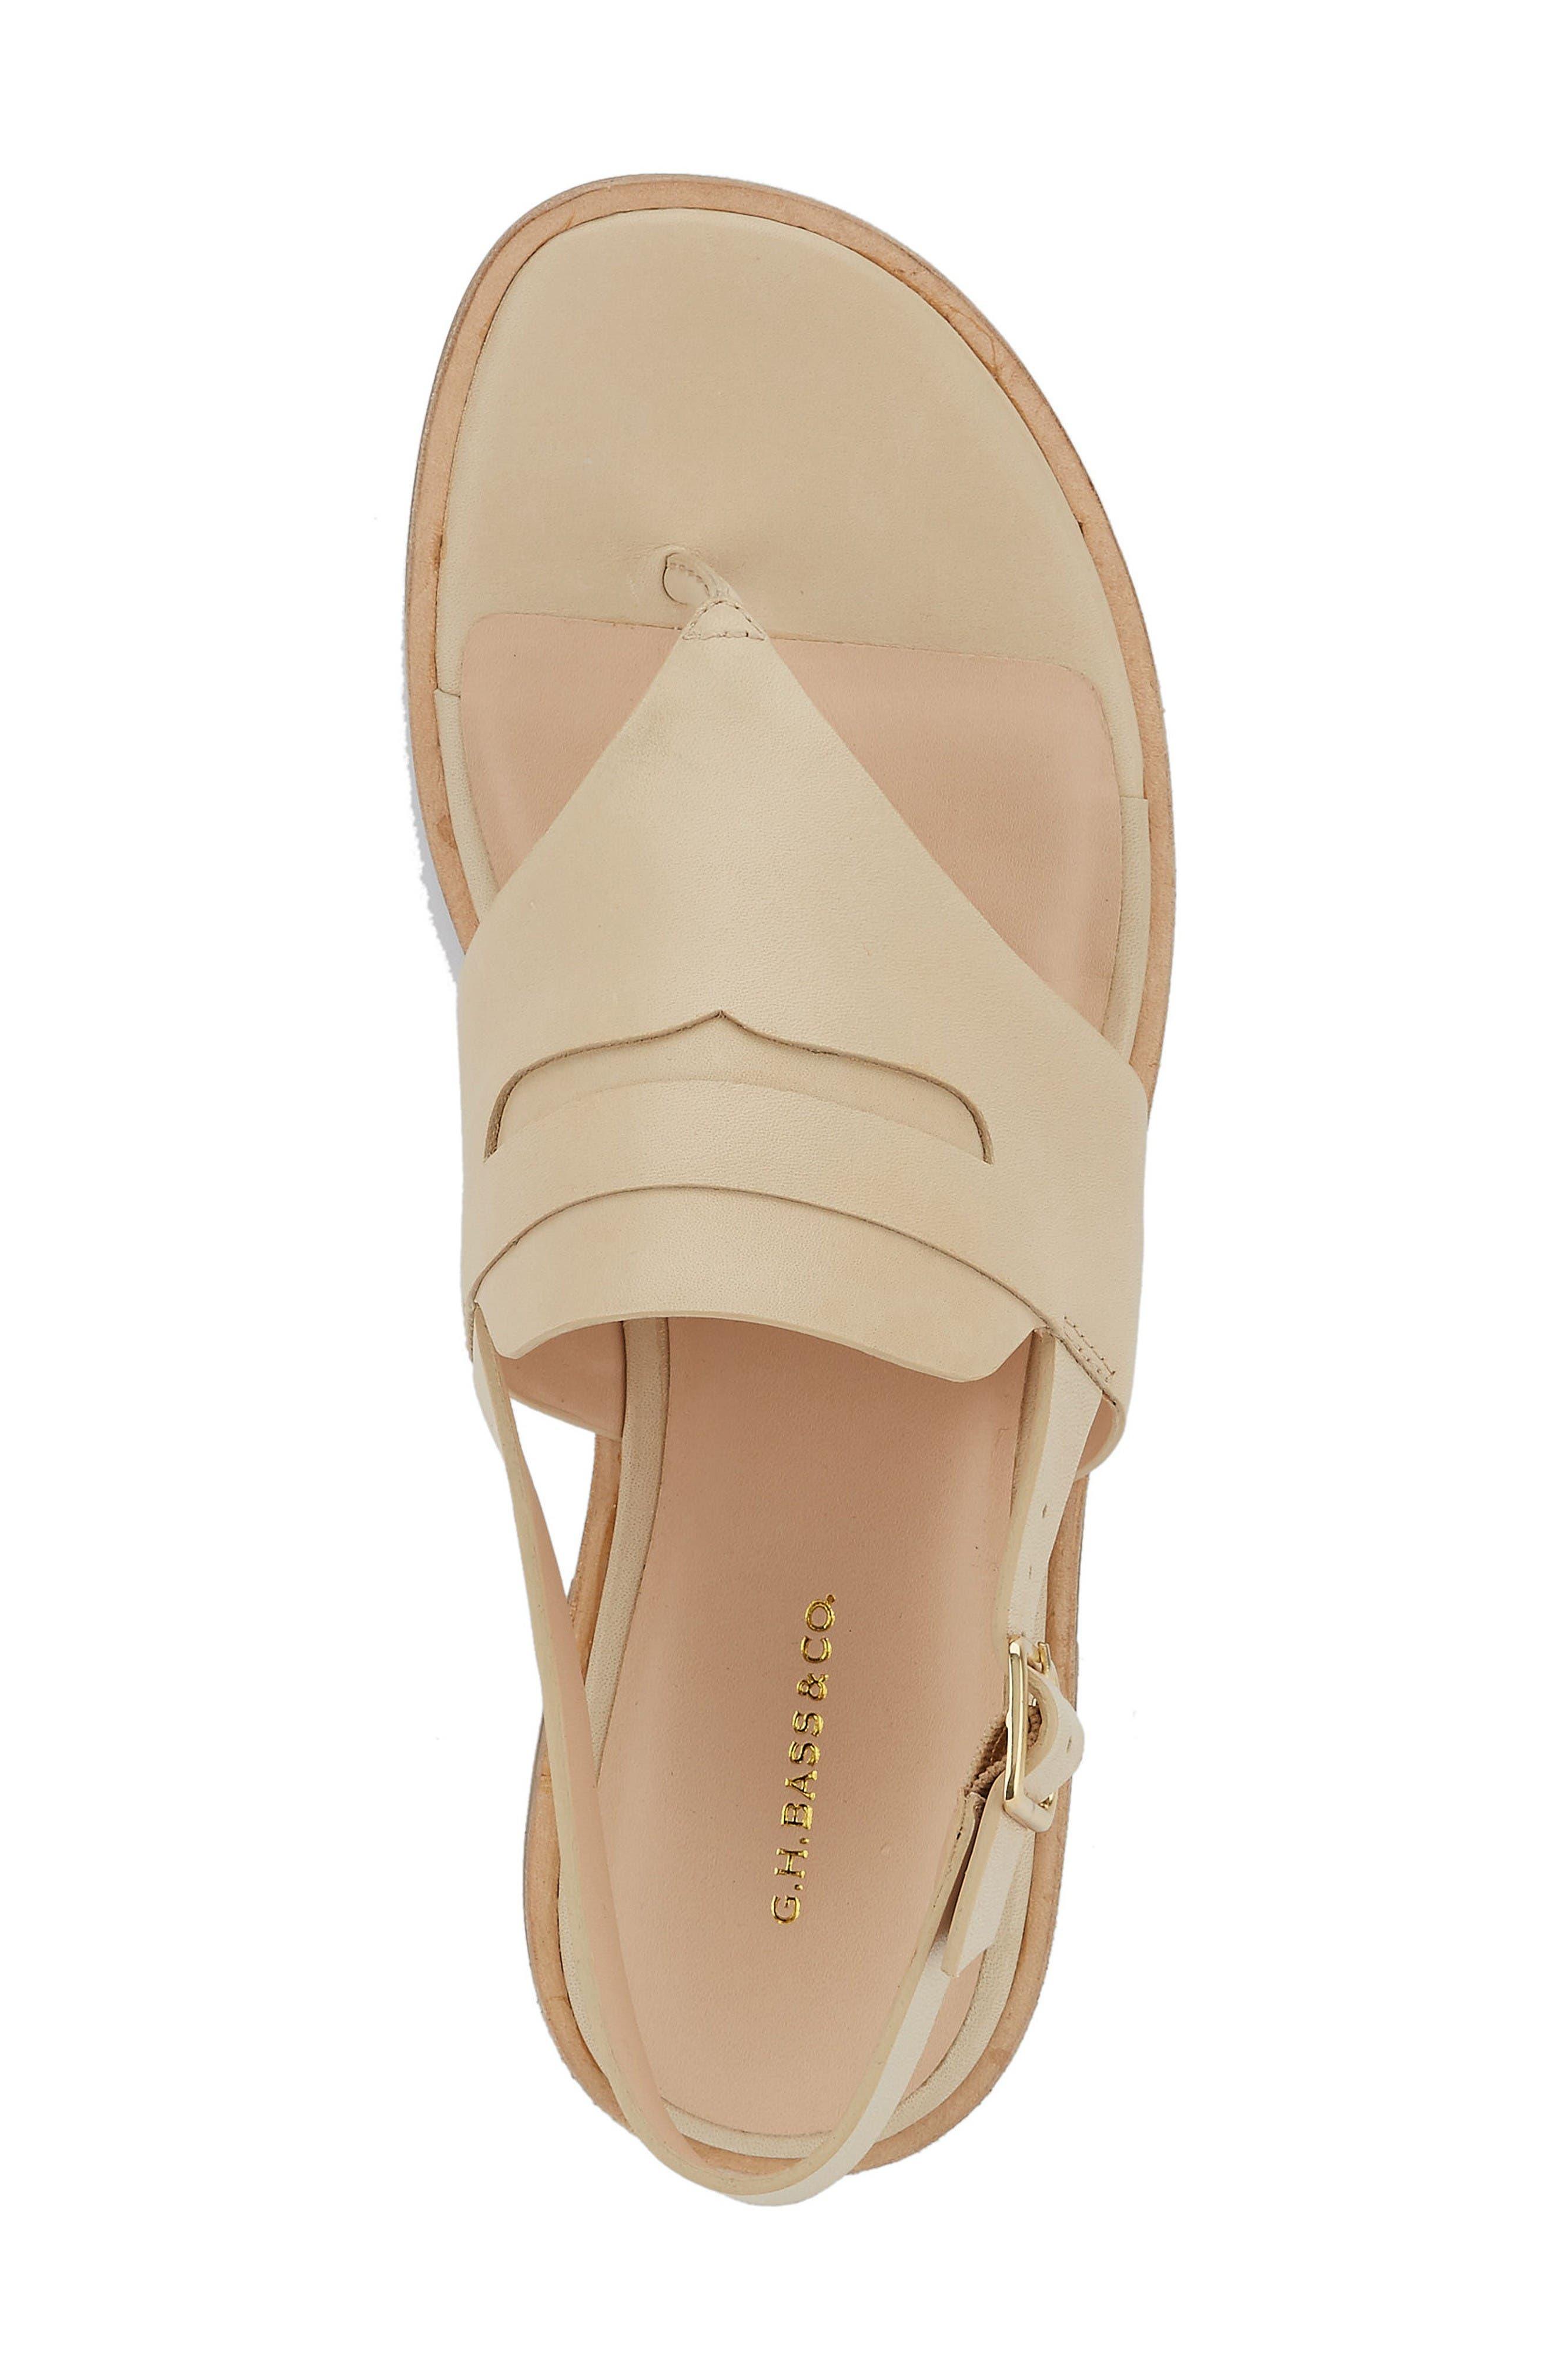 Maddie Slingback Sandal,                             Alternate thumbnail 3, color,                             Cream Leather